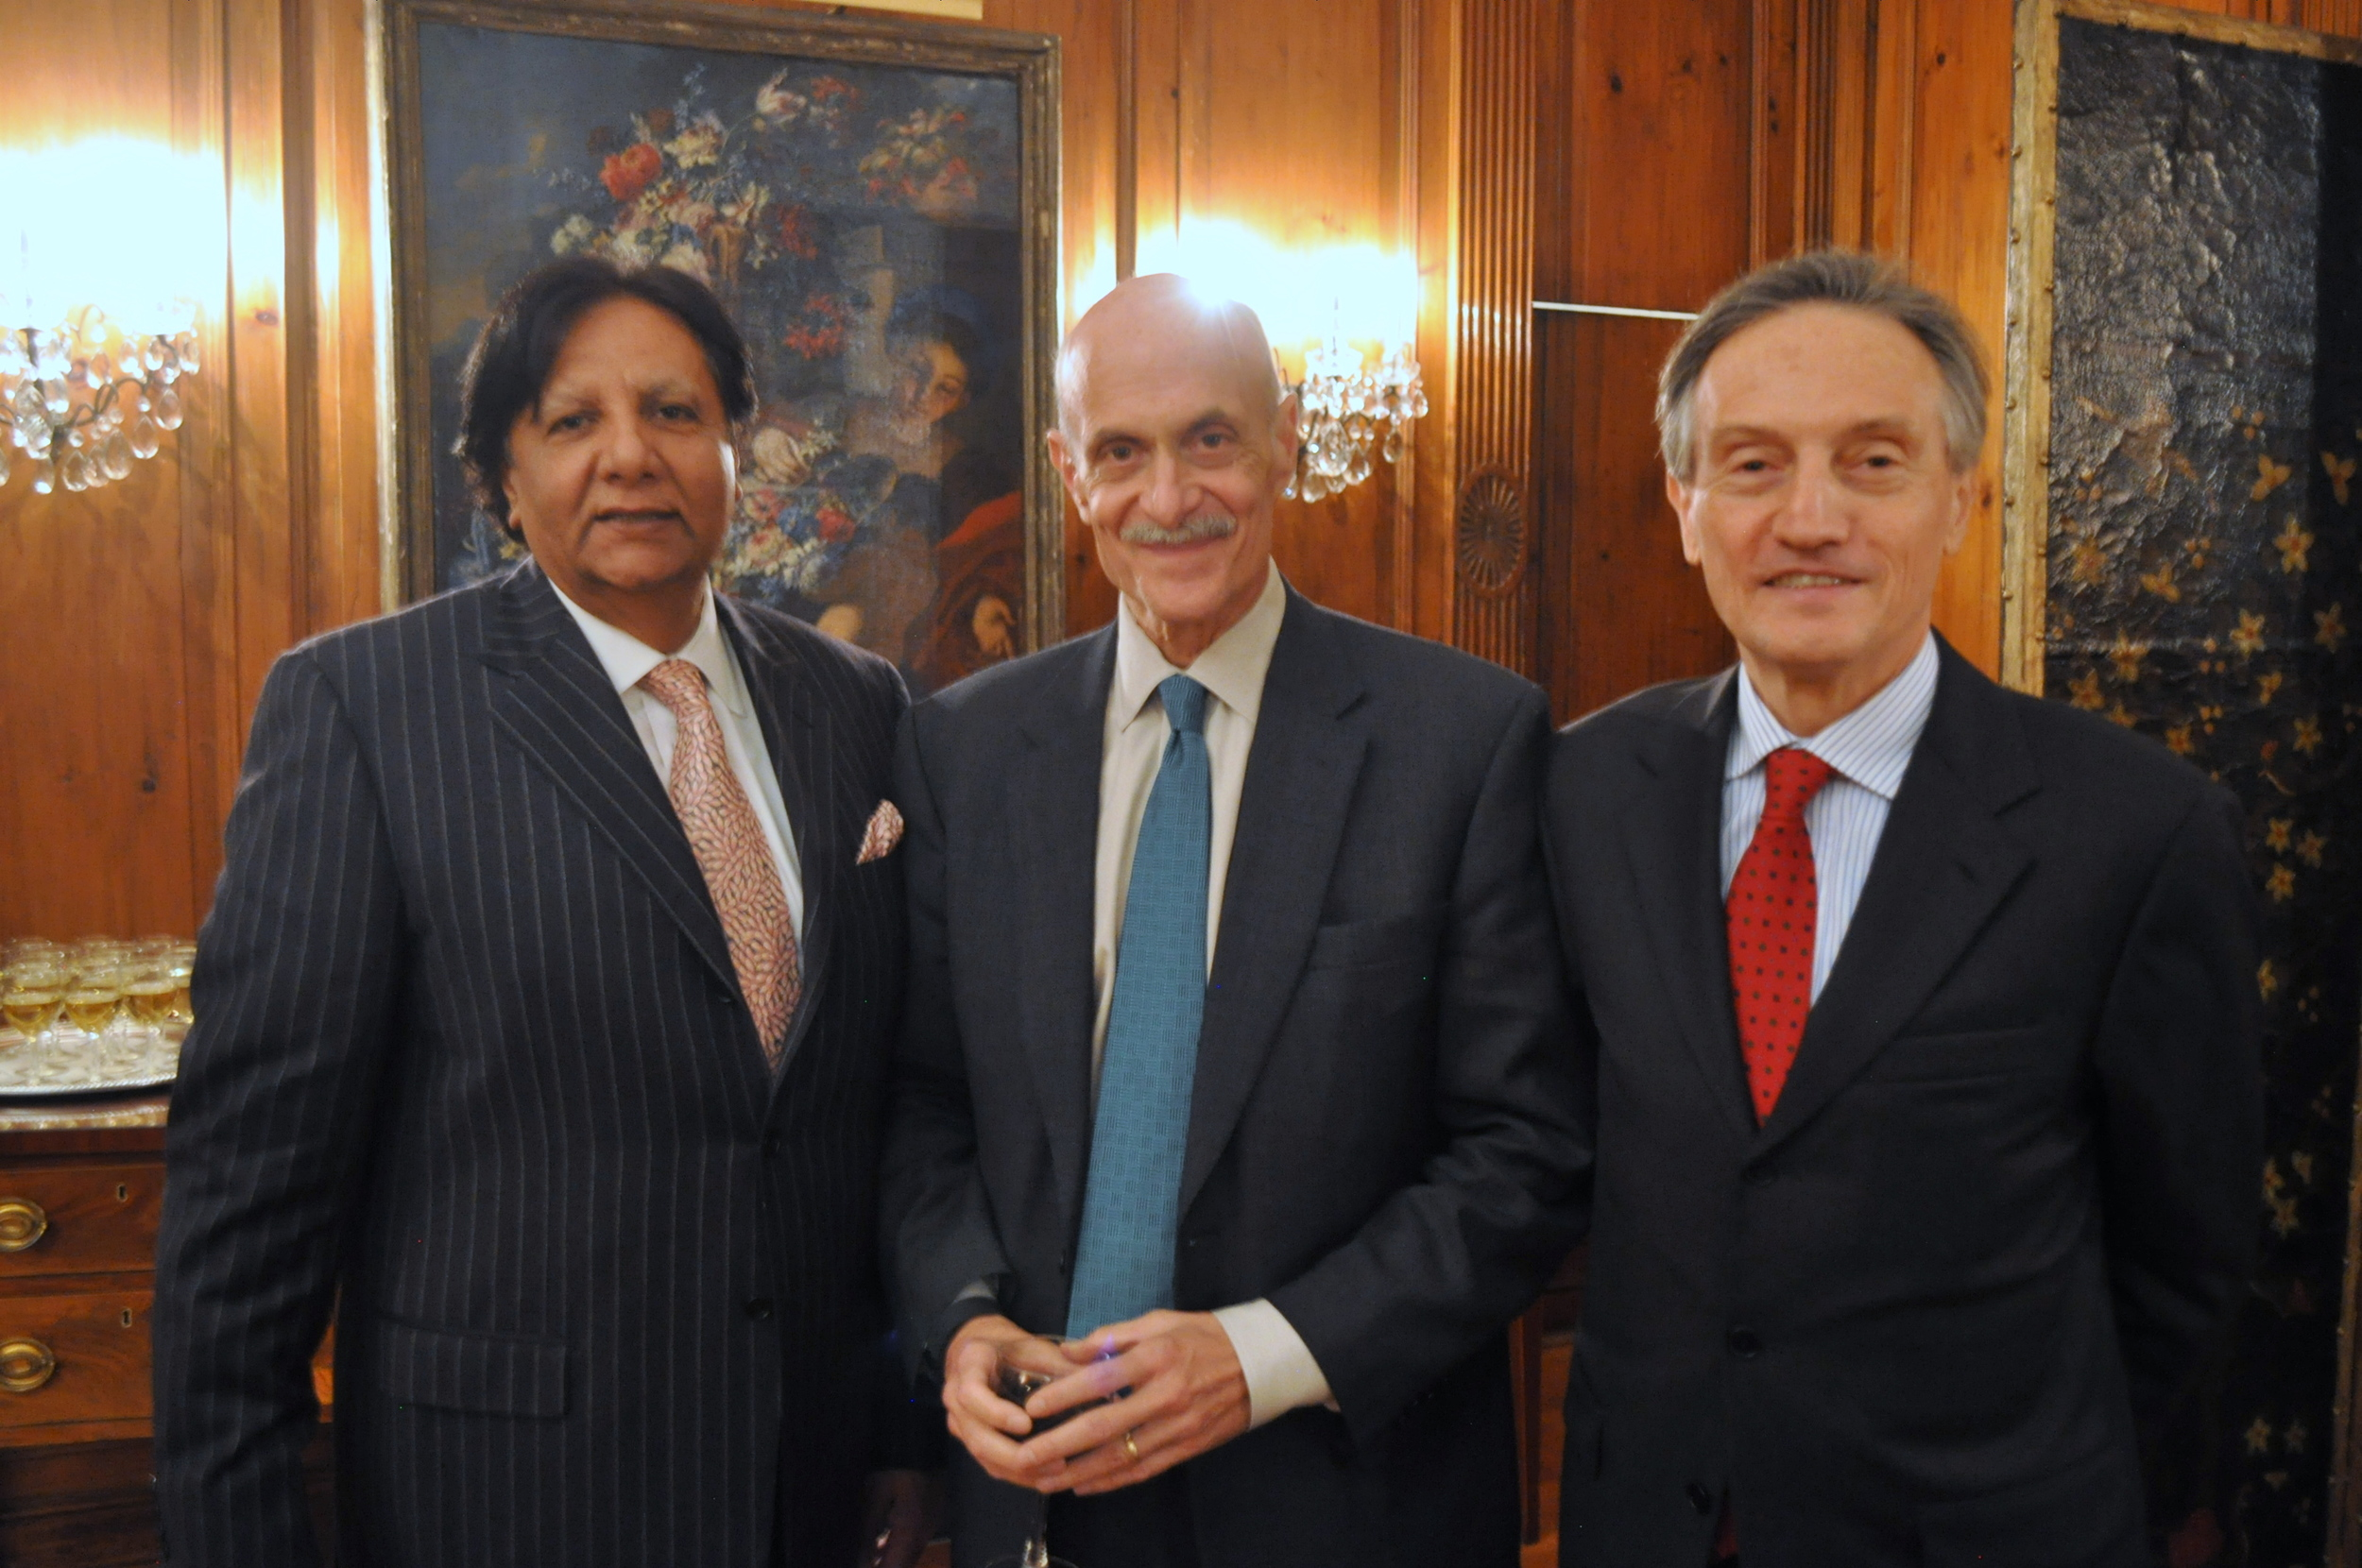 Ambassador-at-large of Pakistan Rafat Mahmood, former Secretary of Homeland Security Michael Chertoff, and Ambassador Italy Claudio Bisogniero.